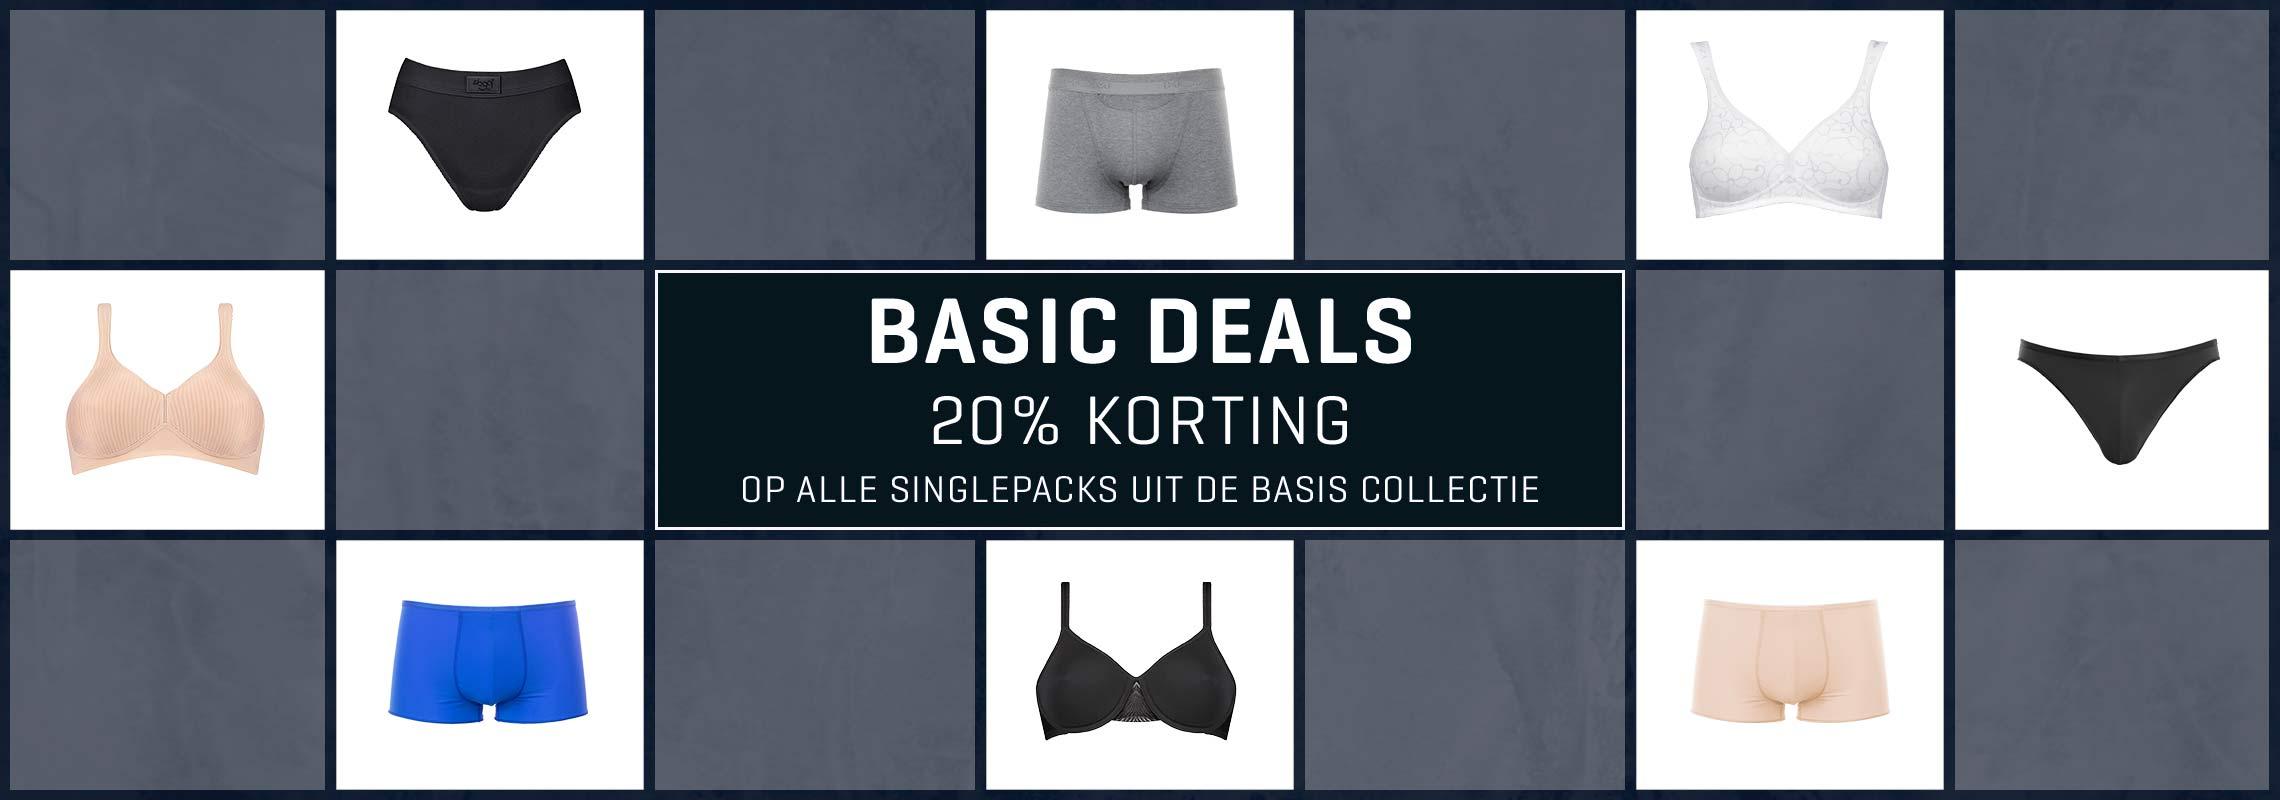 BASIC DEALS - 20% korting op singlepacks